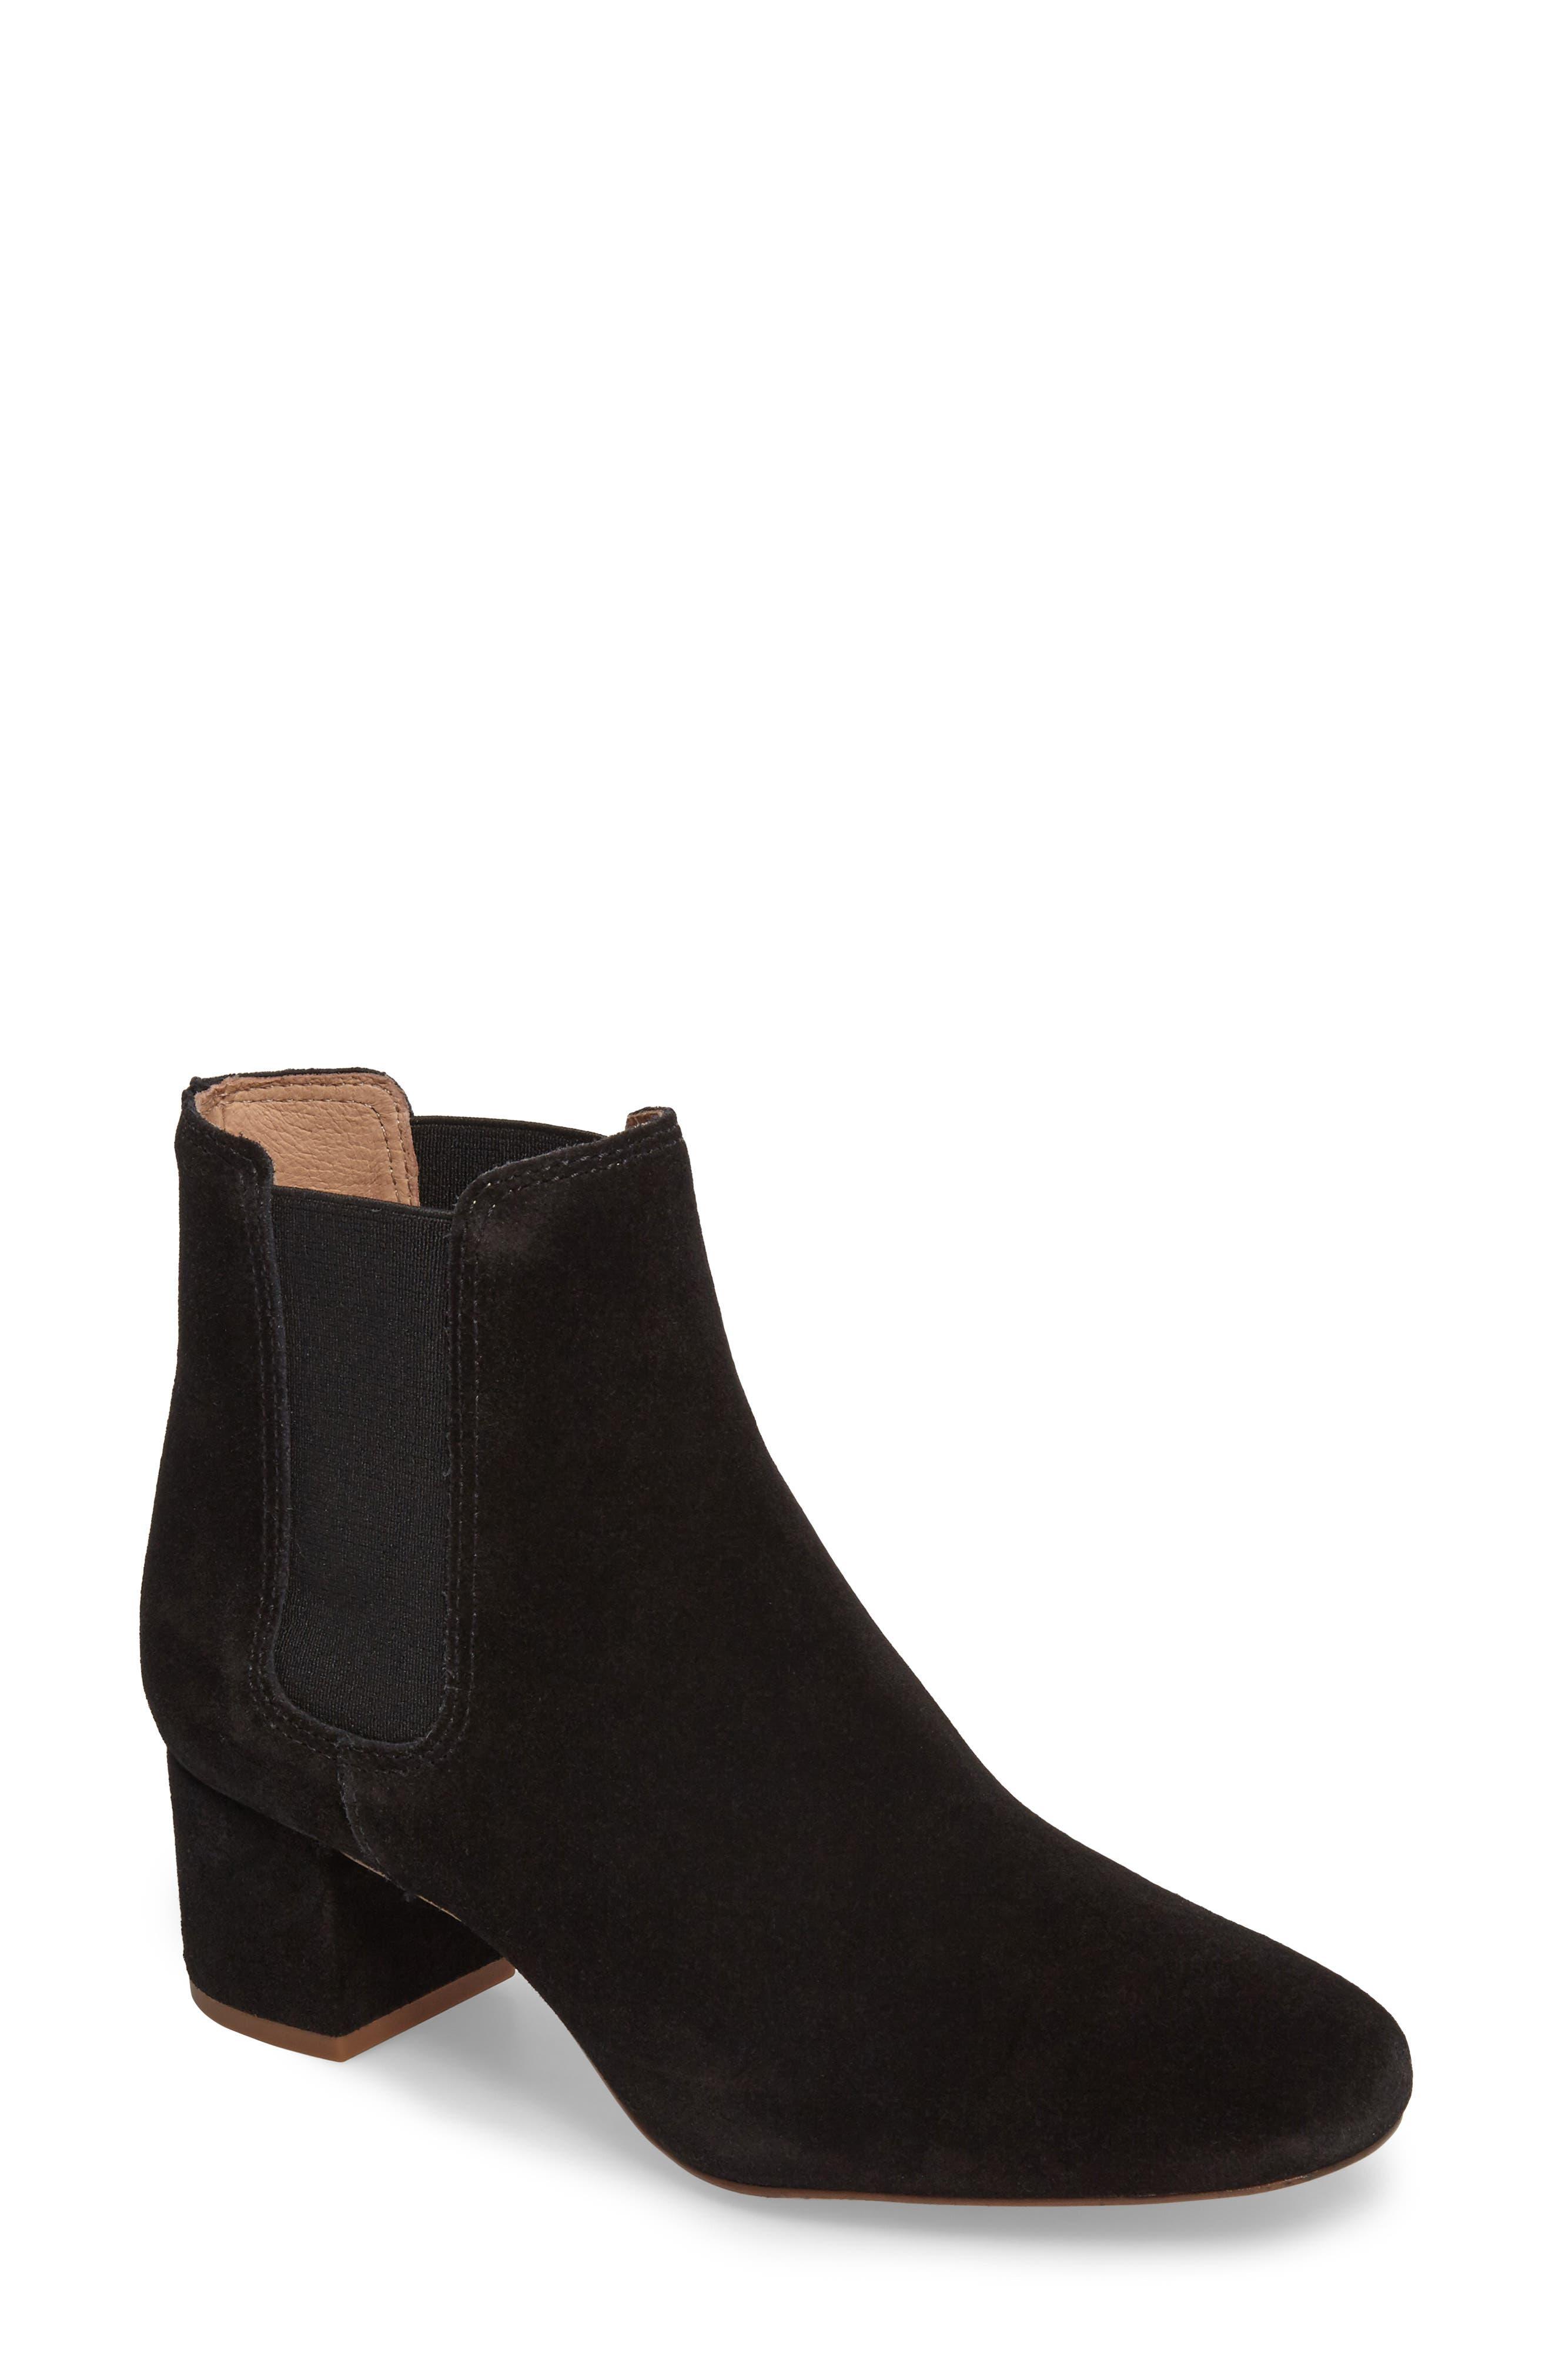 Walker Chelsea Boot,                         Main,                         color, True Black Suede